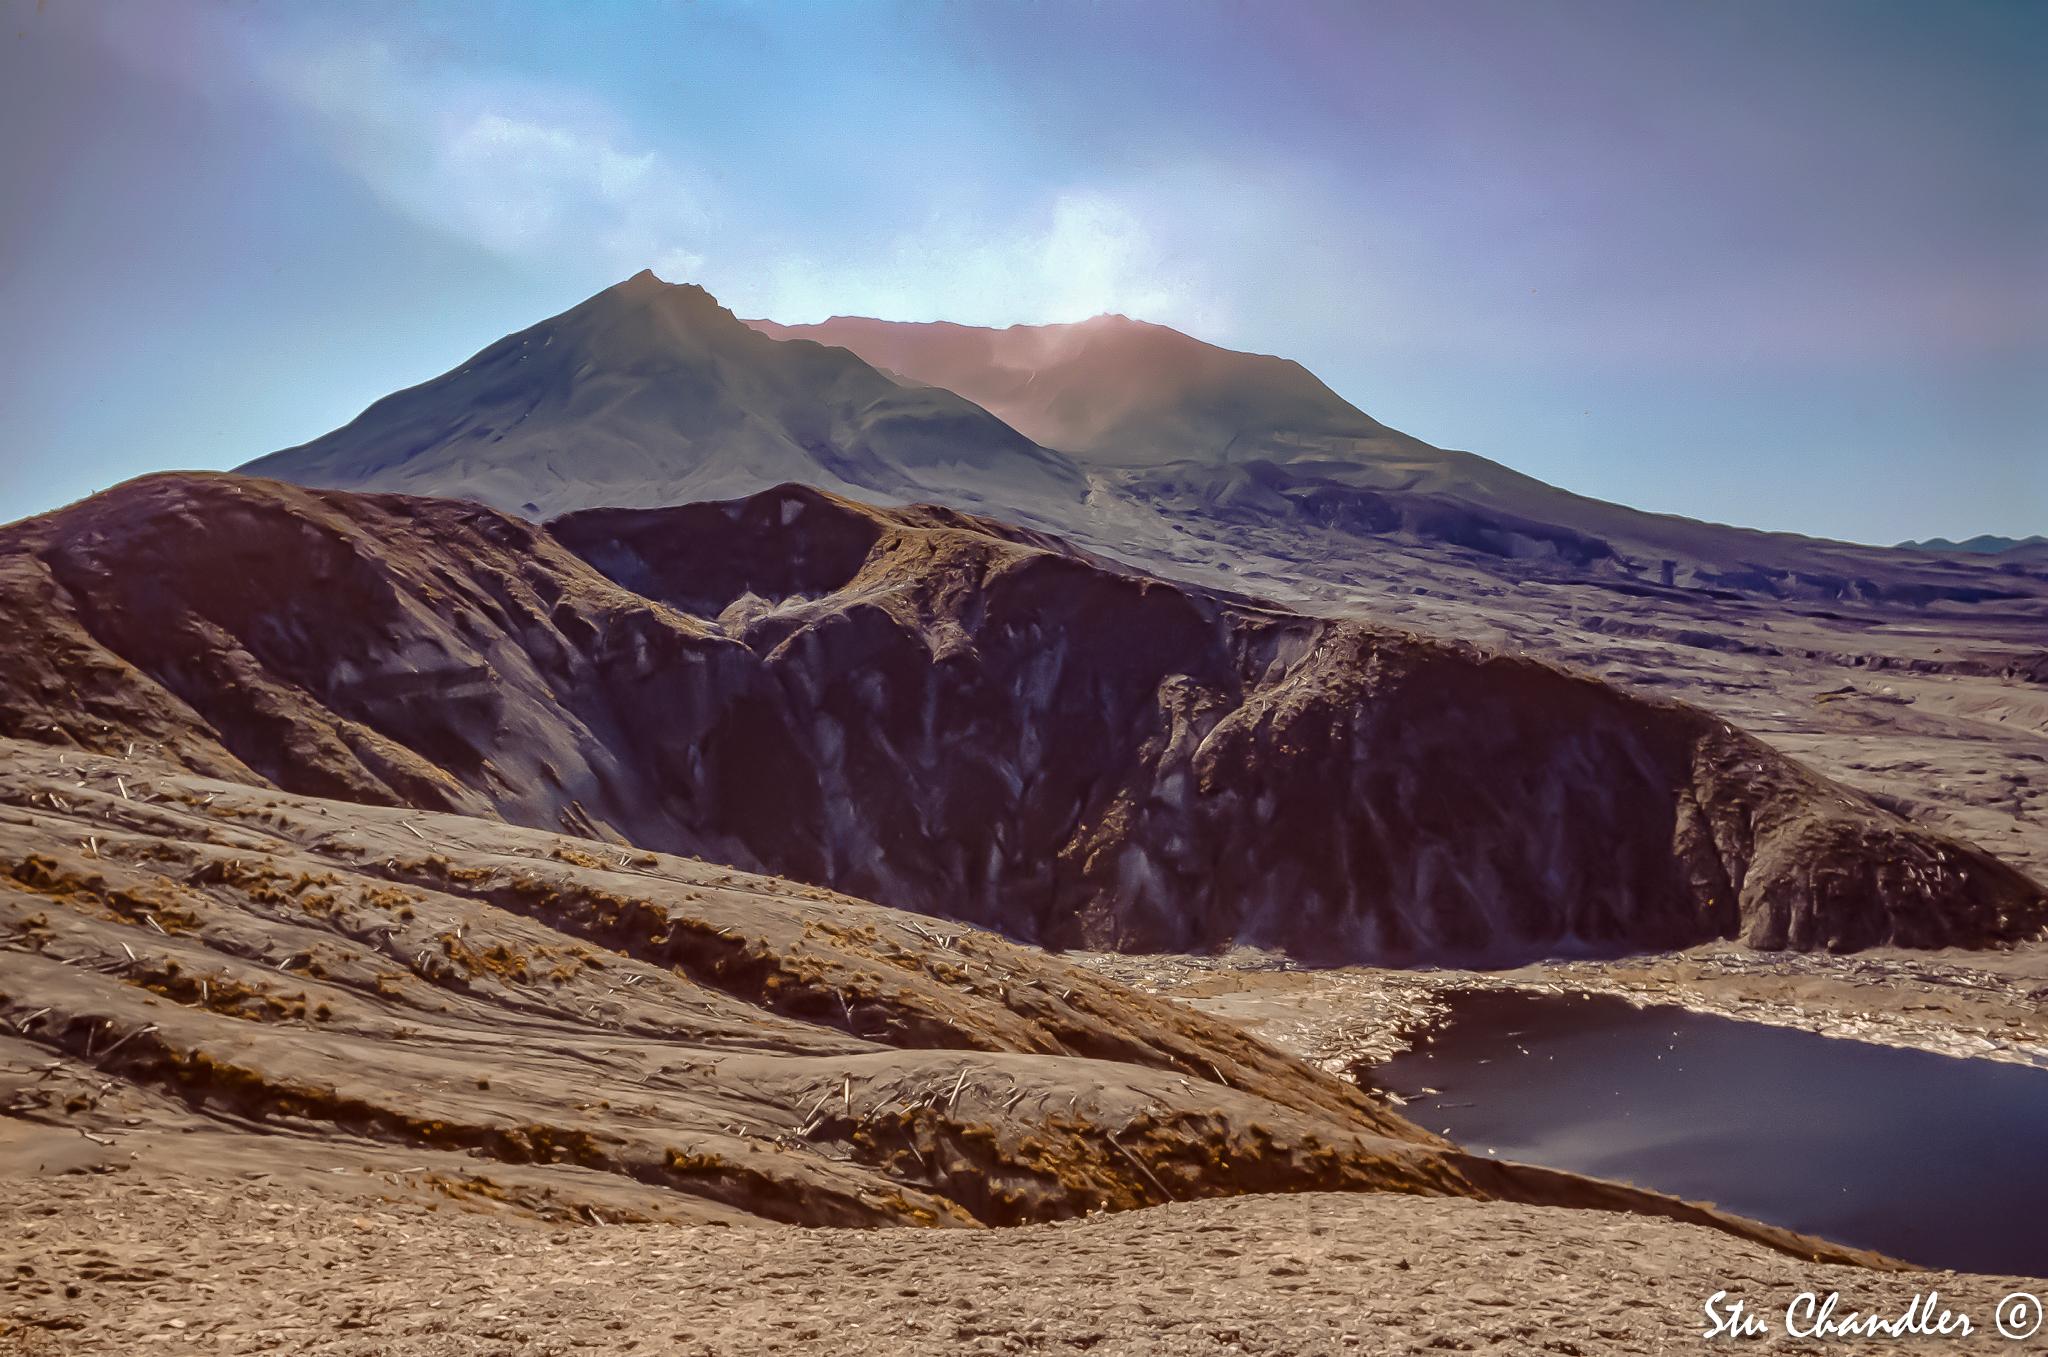 USA - Washington - Mt St Helens (1991)